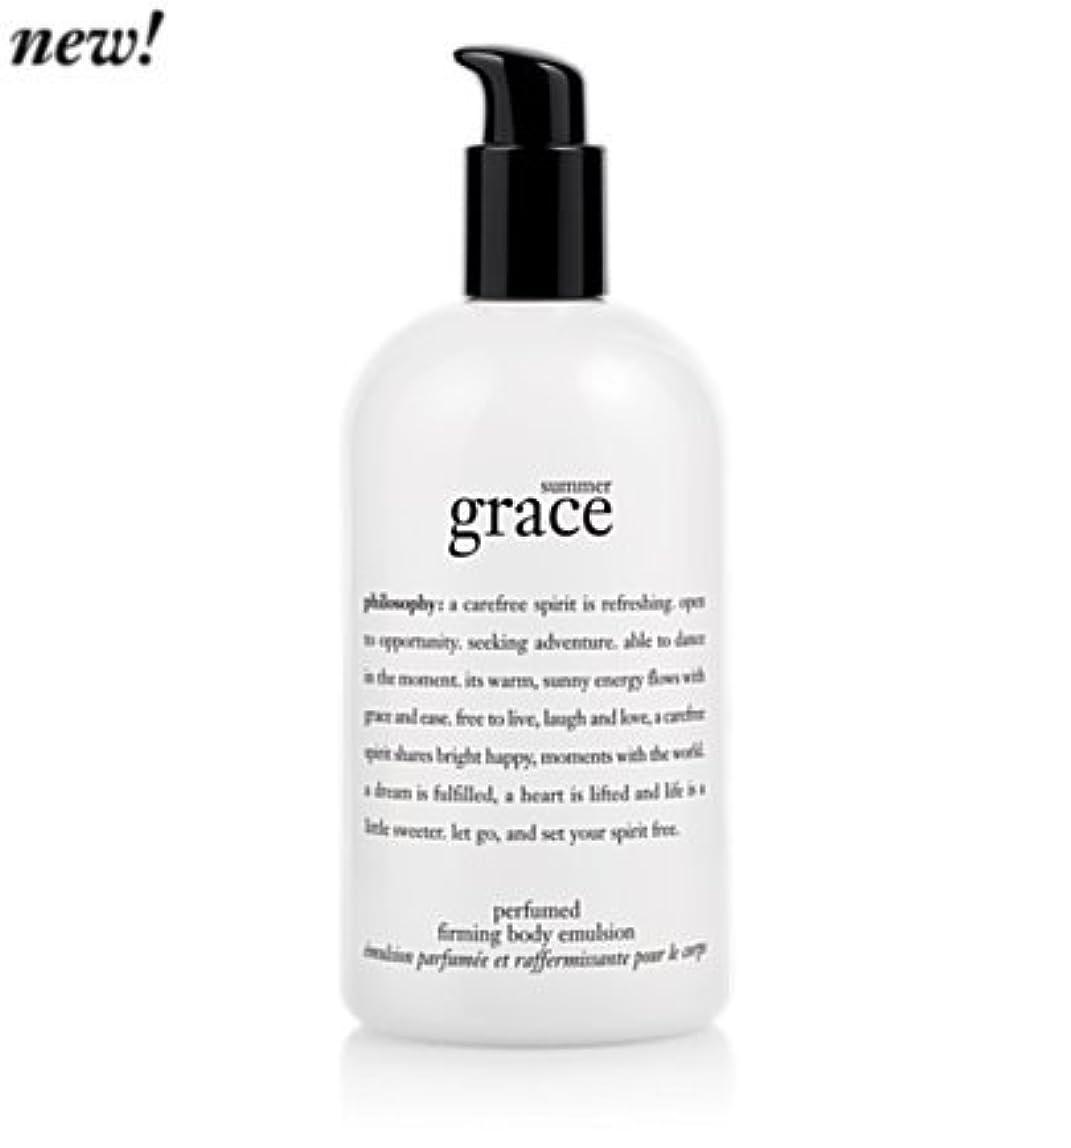 'summer grace (サマーグレイス) 16.0 oz (480ml) perfumed firming body emulsion for Women